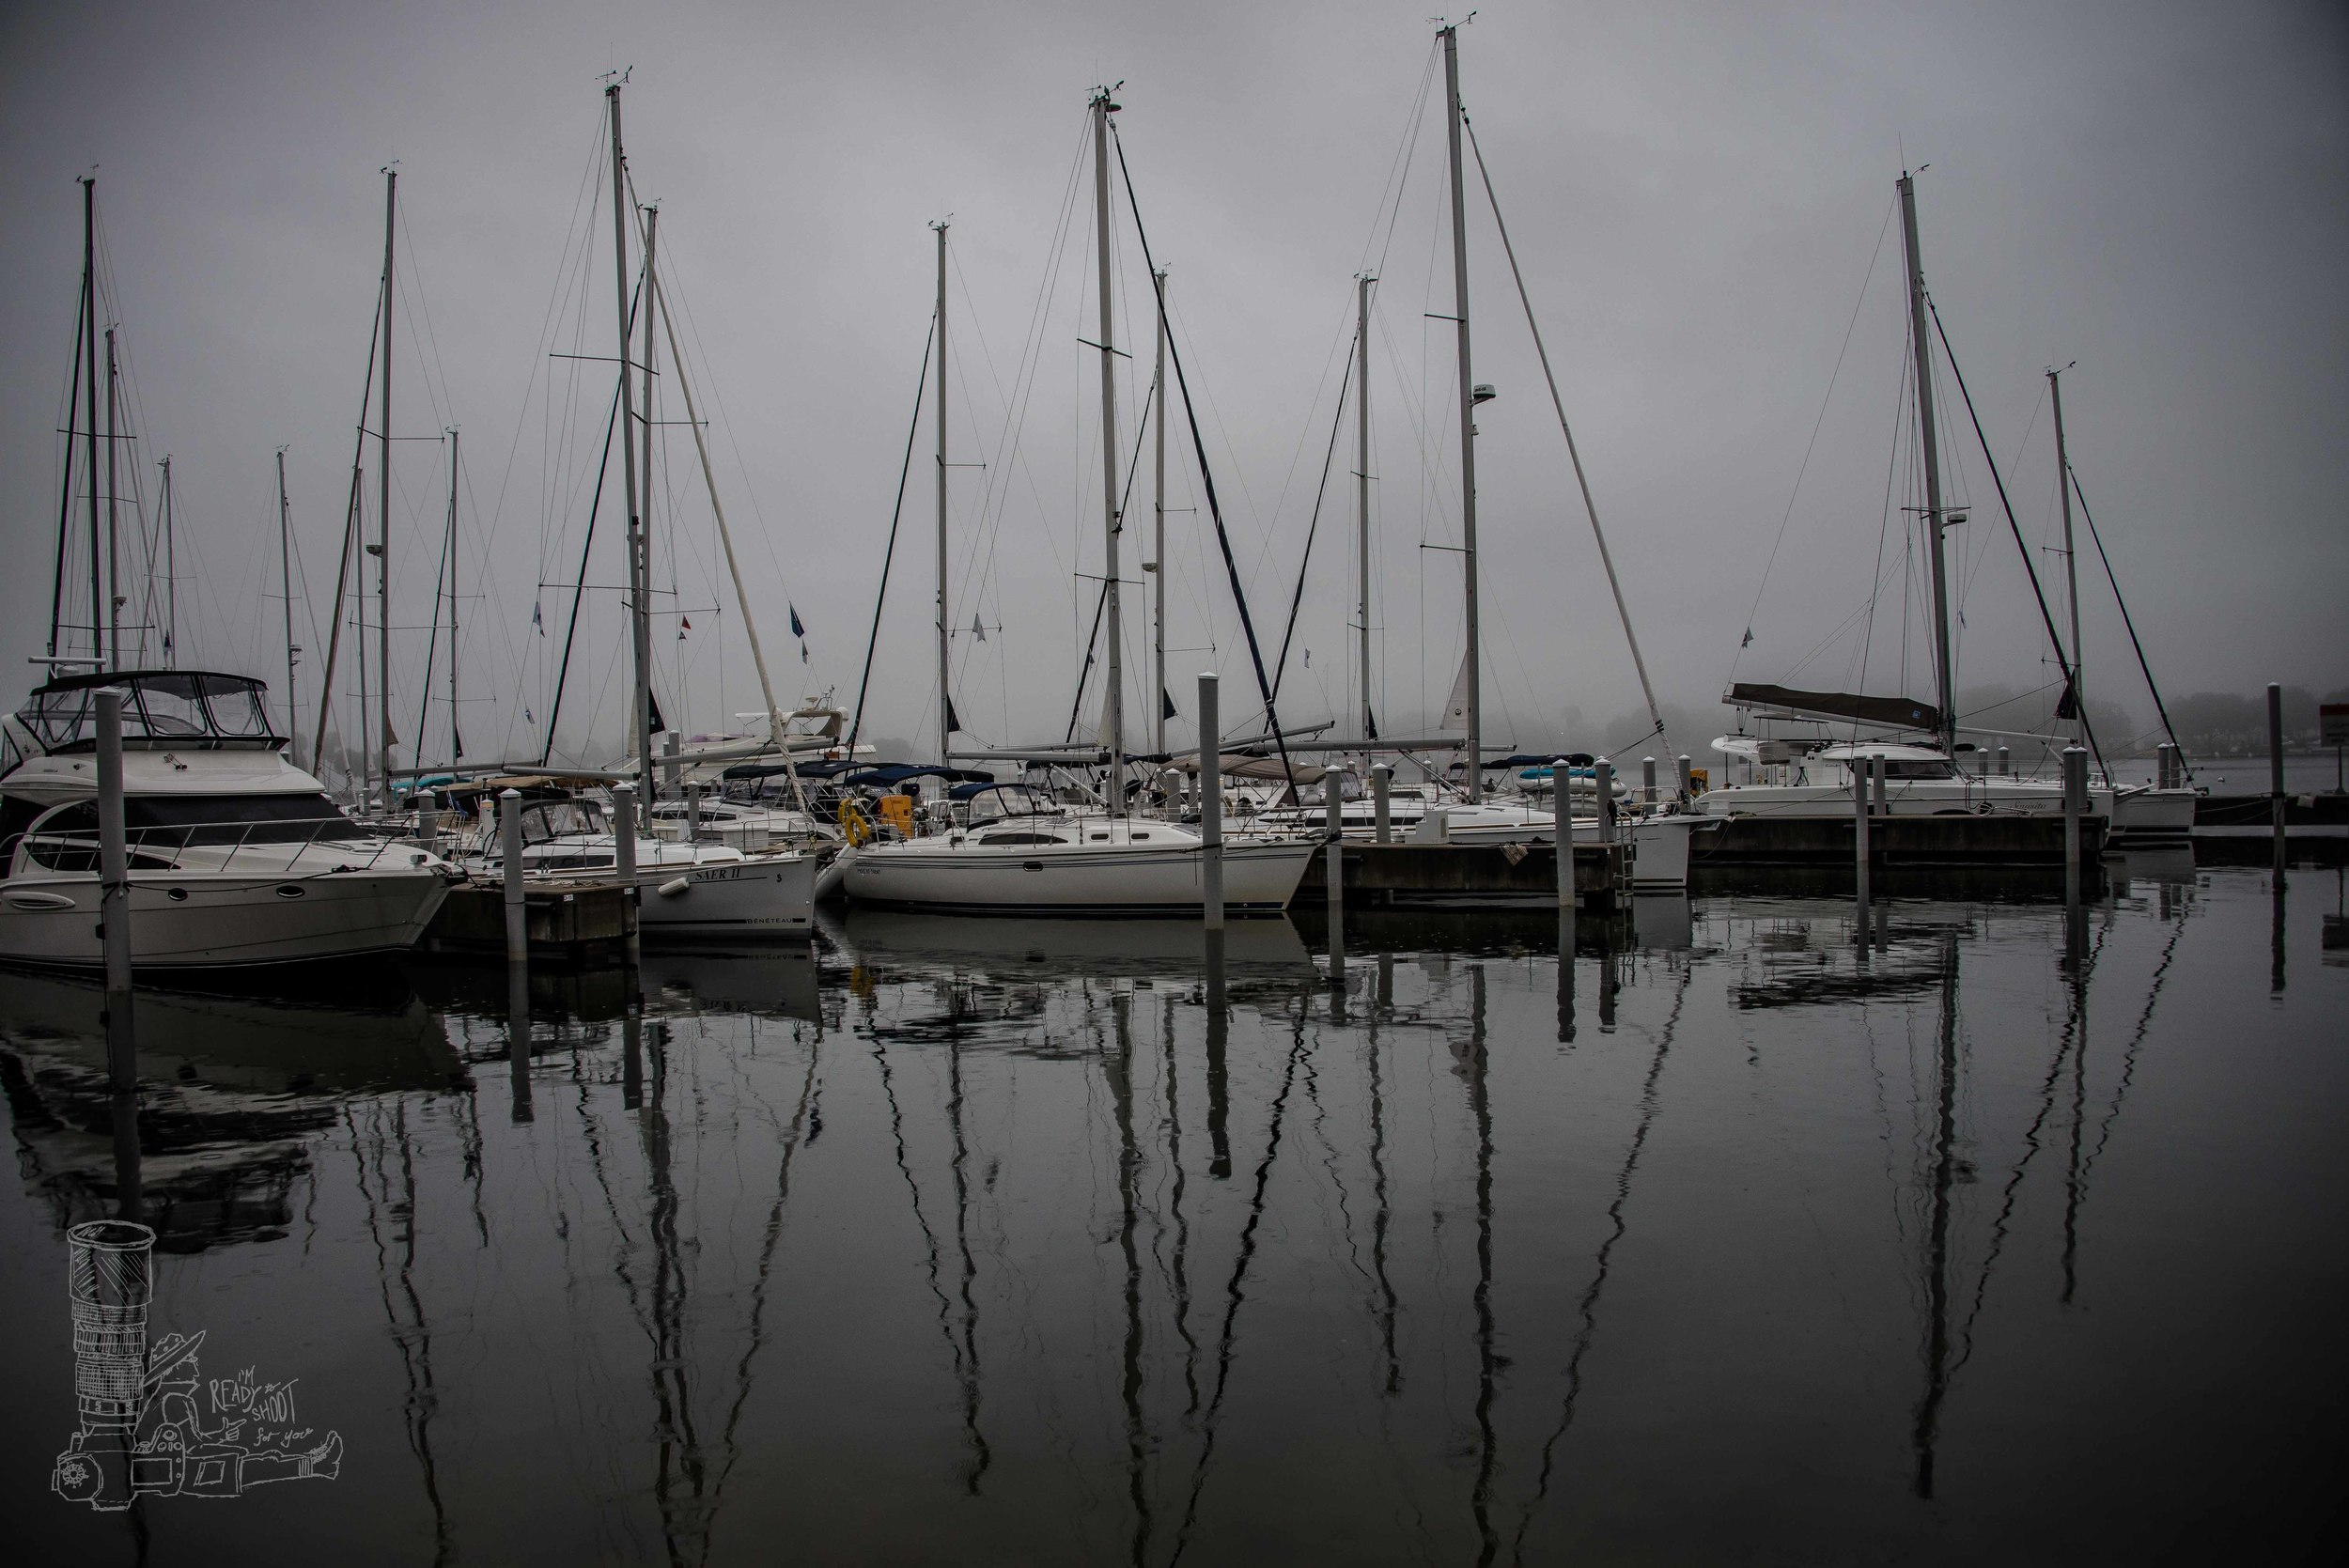 Harbor of St Pete